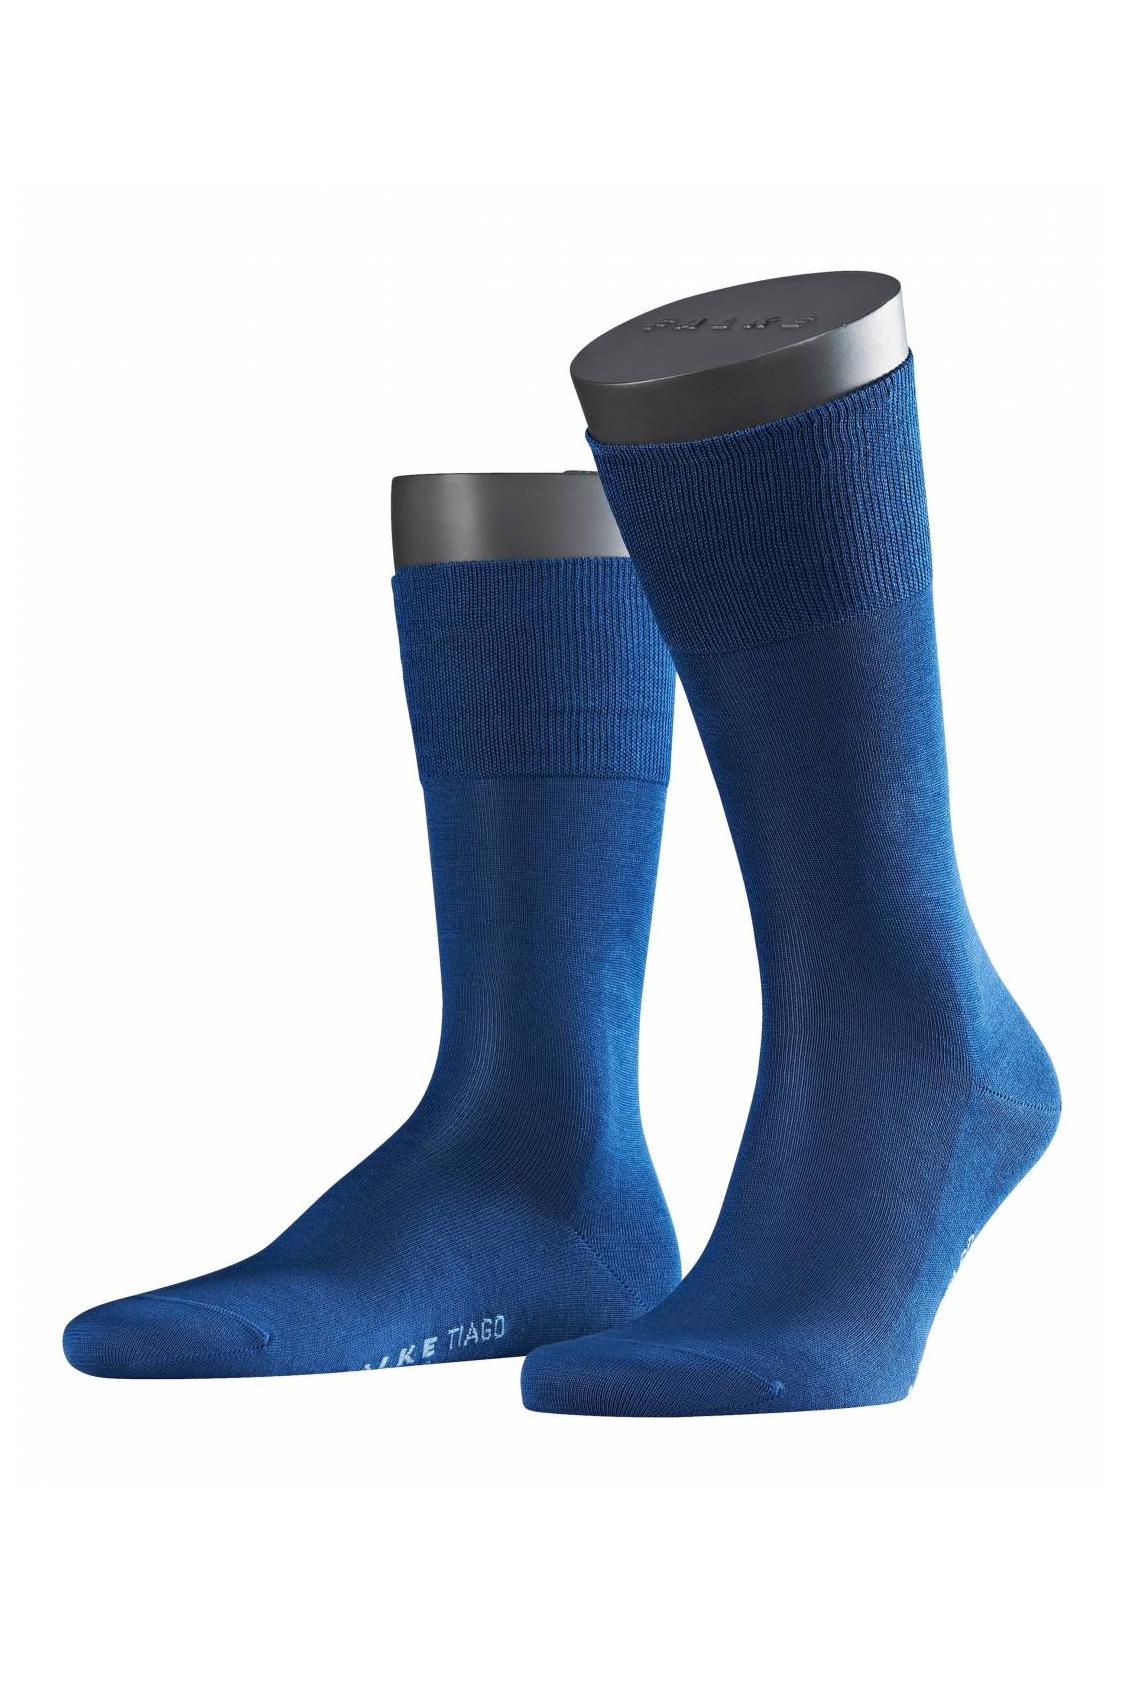 FALKE Tiago - Ciorap Royal Blue